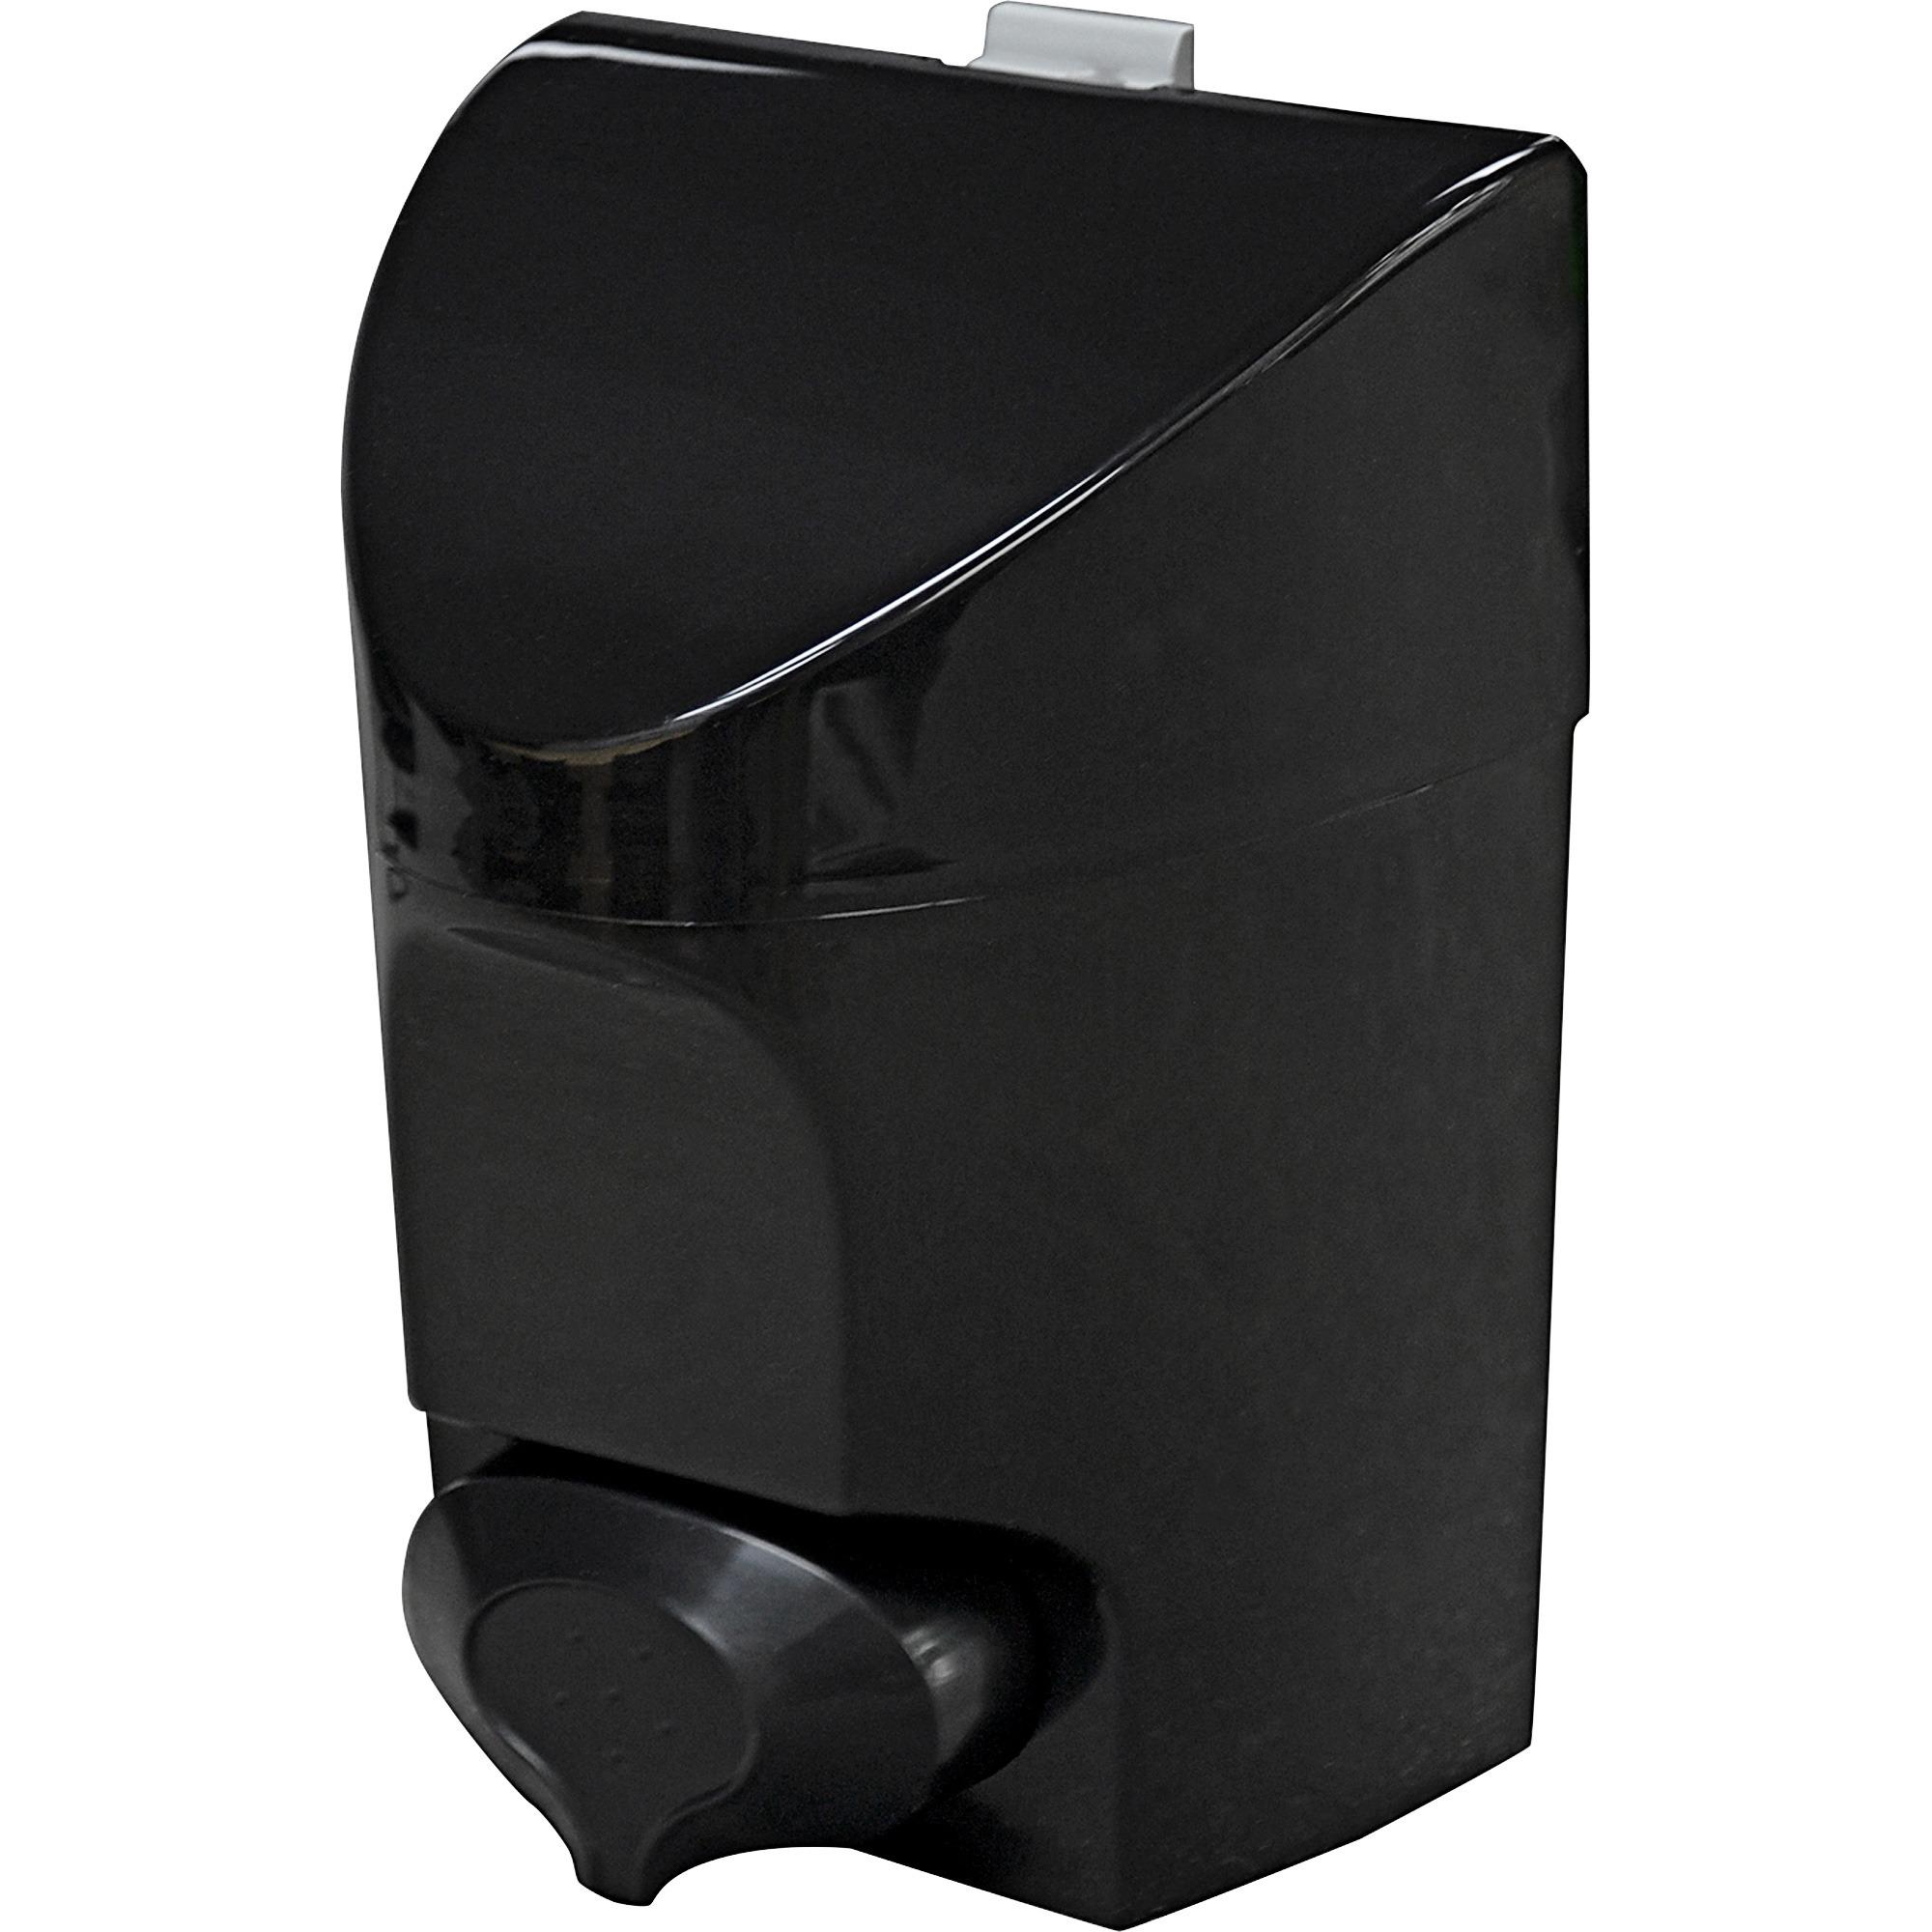 Dura Plus Push Button Soap Dispenser   Manual   887.21 ML Capacity   Black    1Each